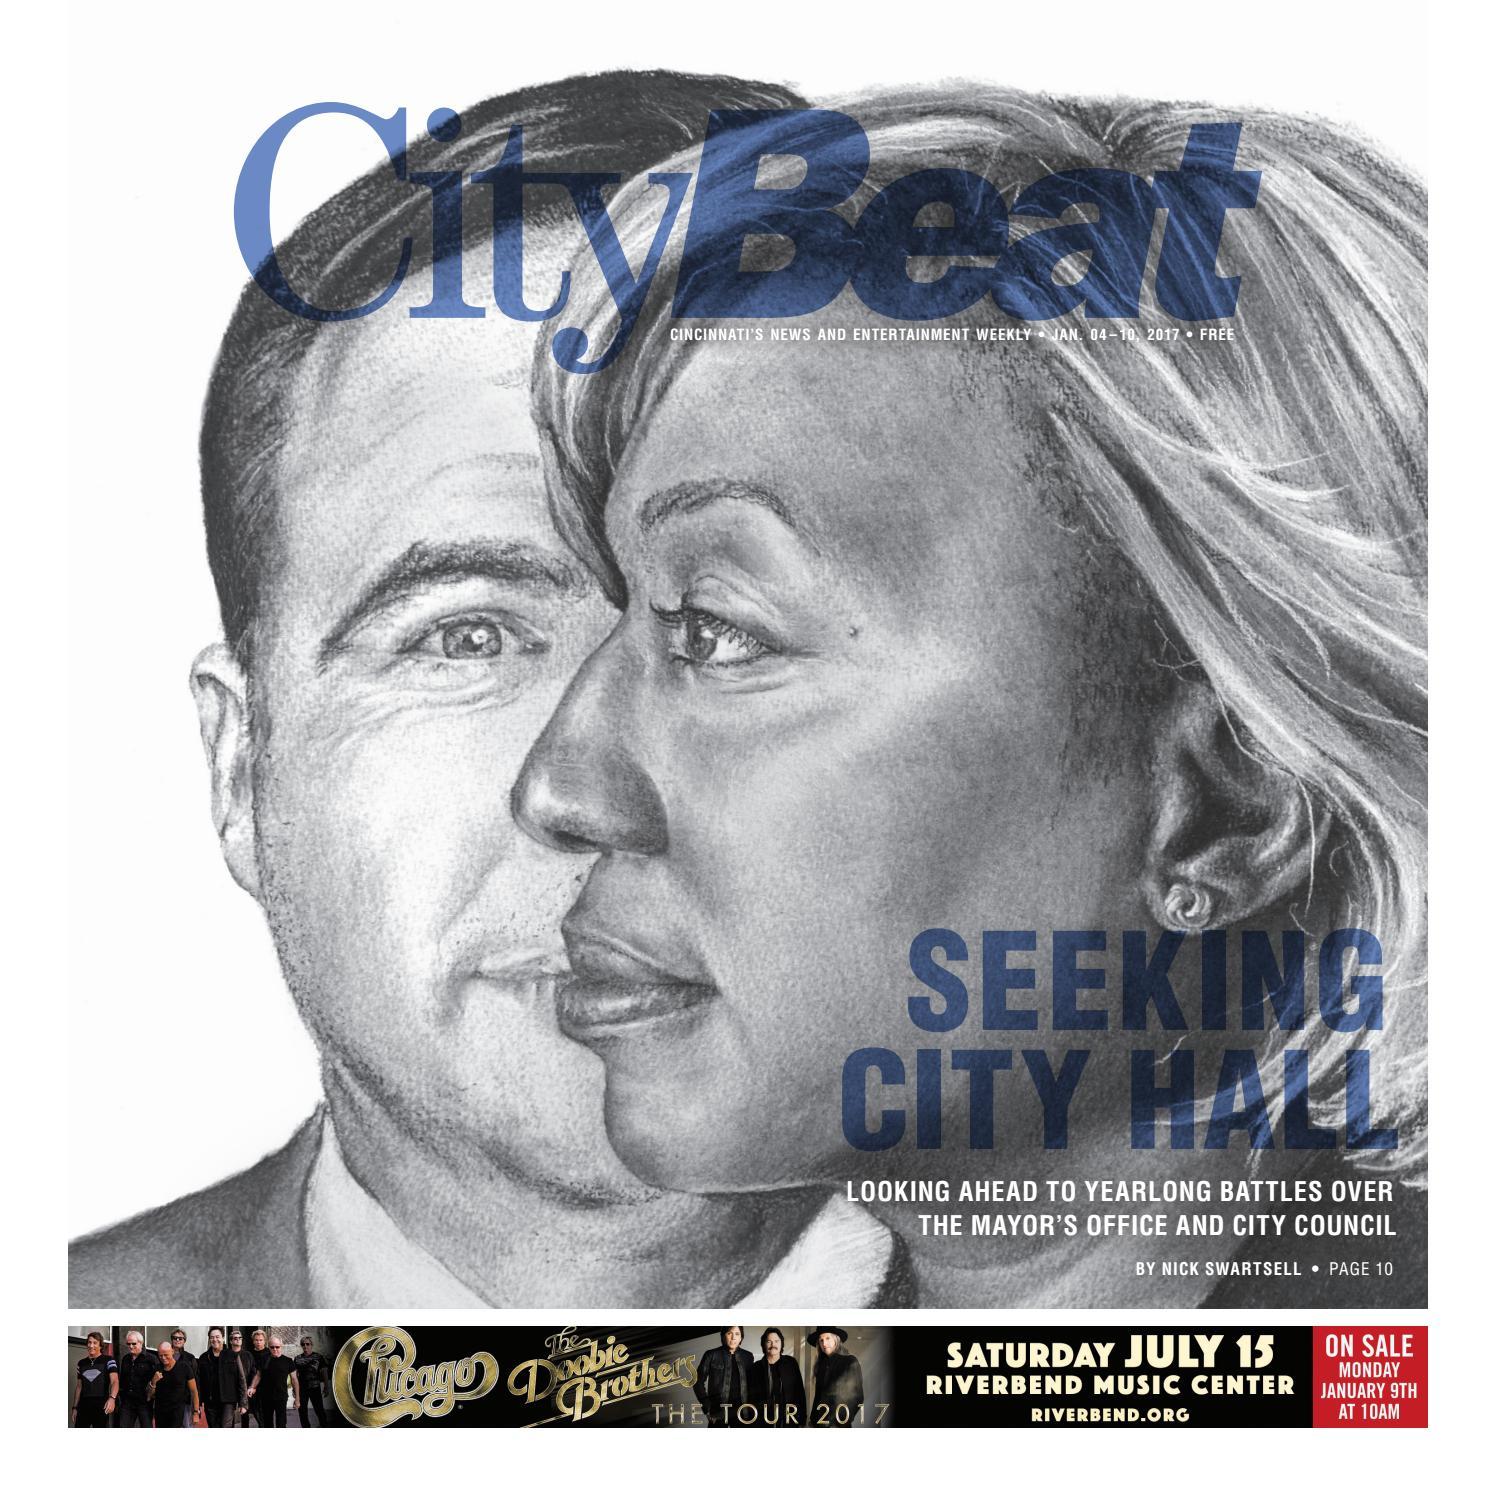 citybeat jan 04 2017 by cincinnati citybeat issuu